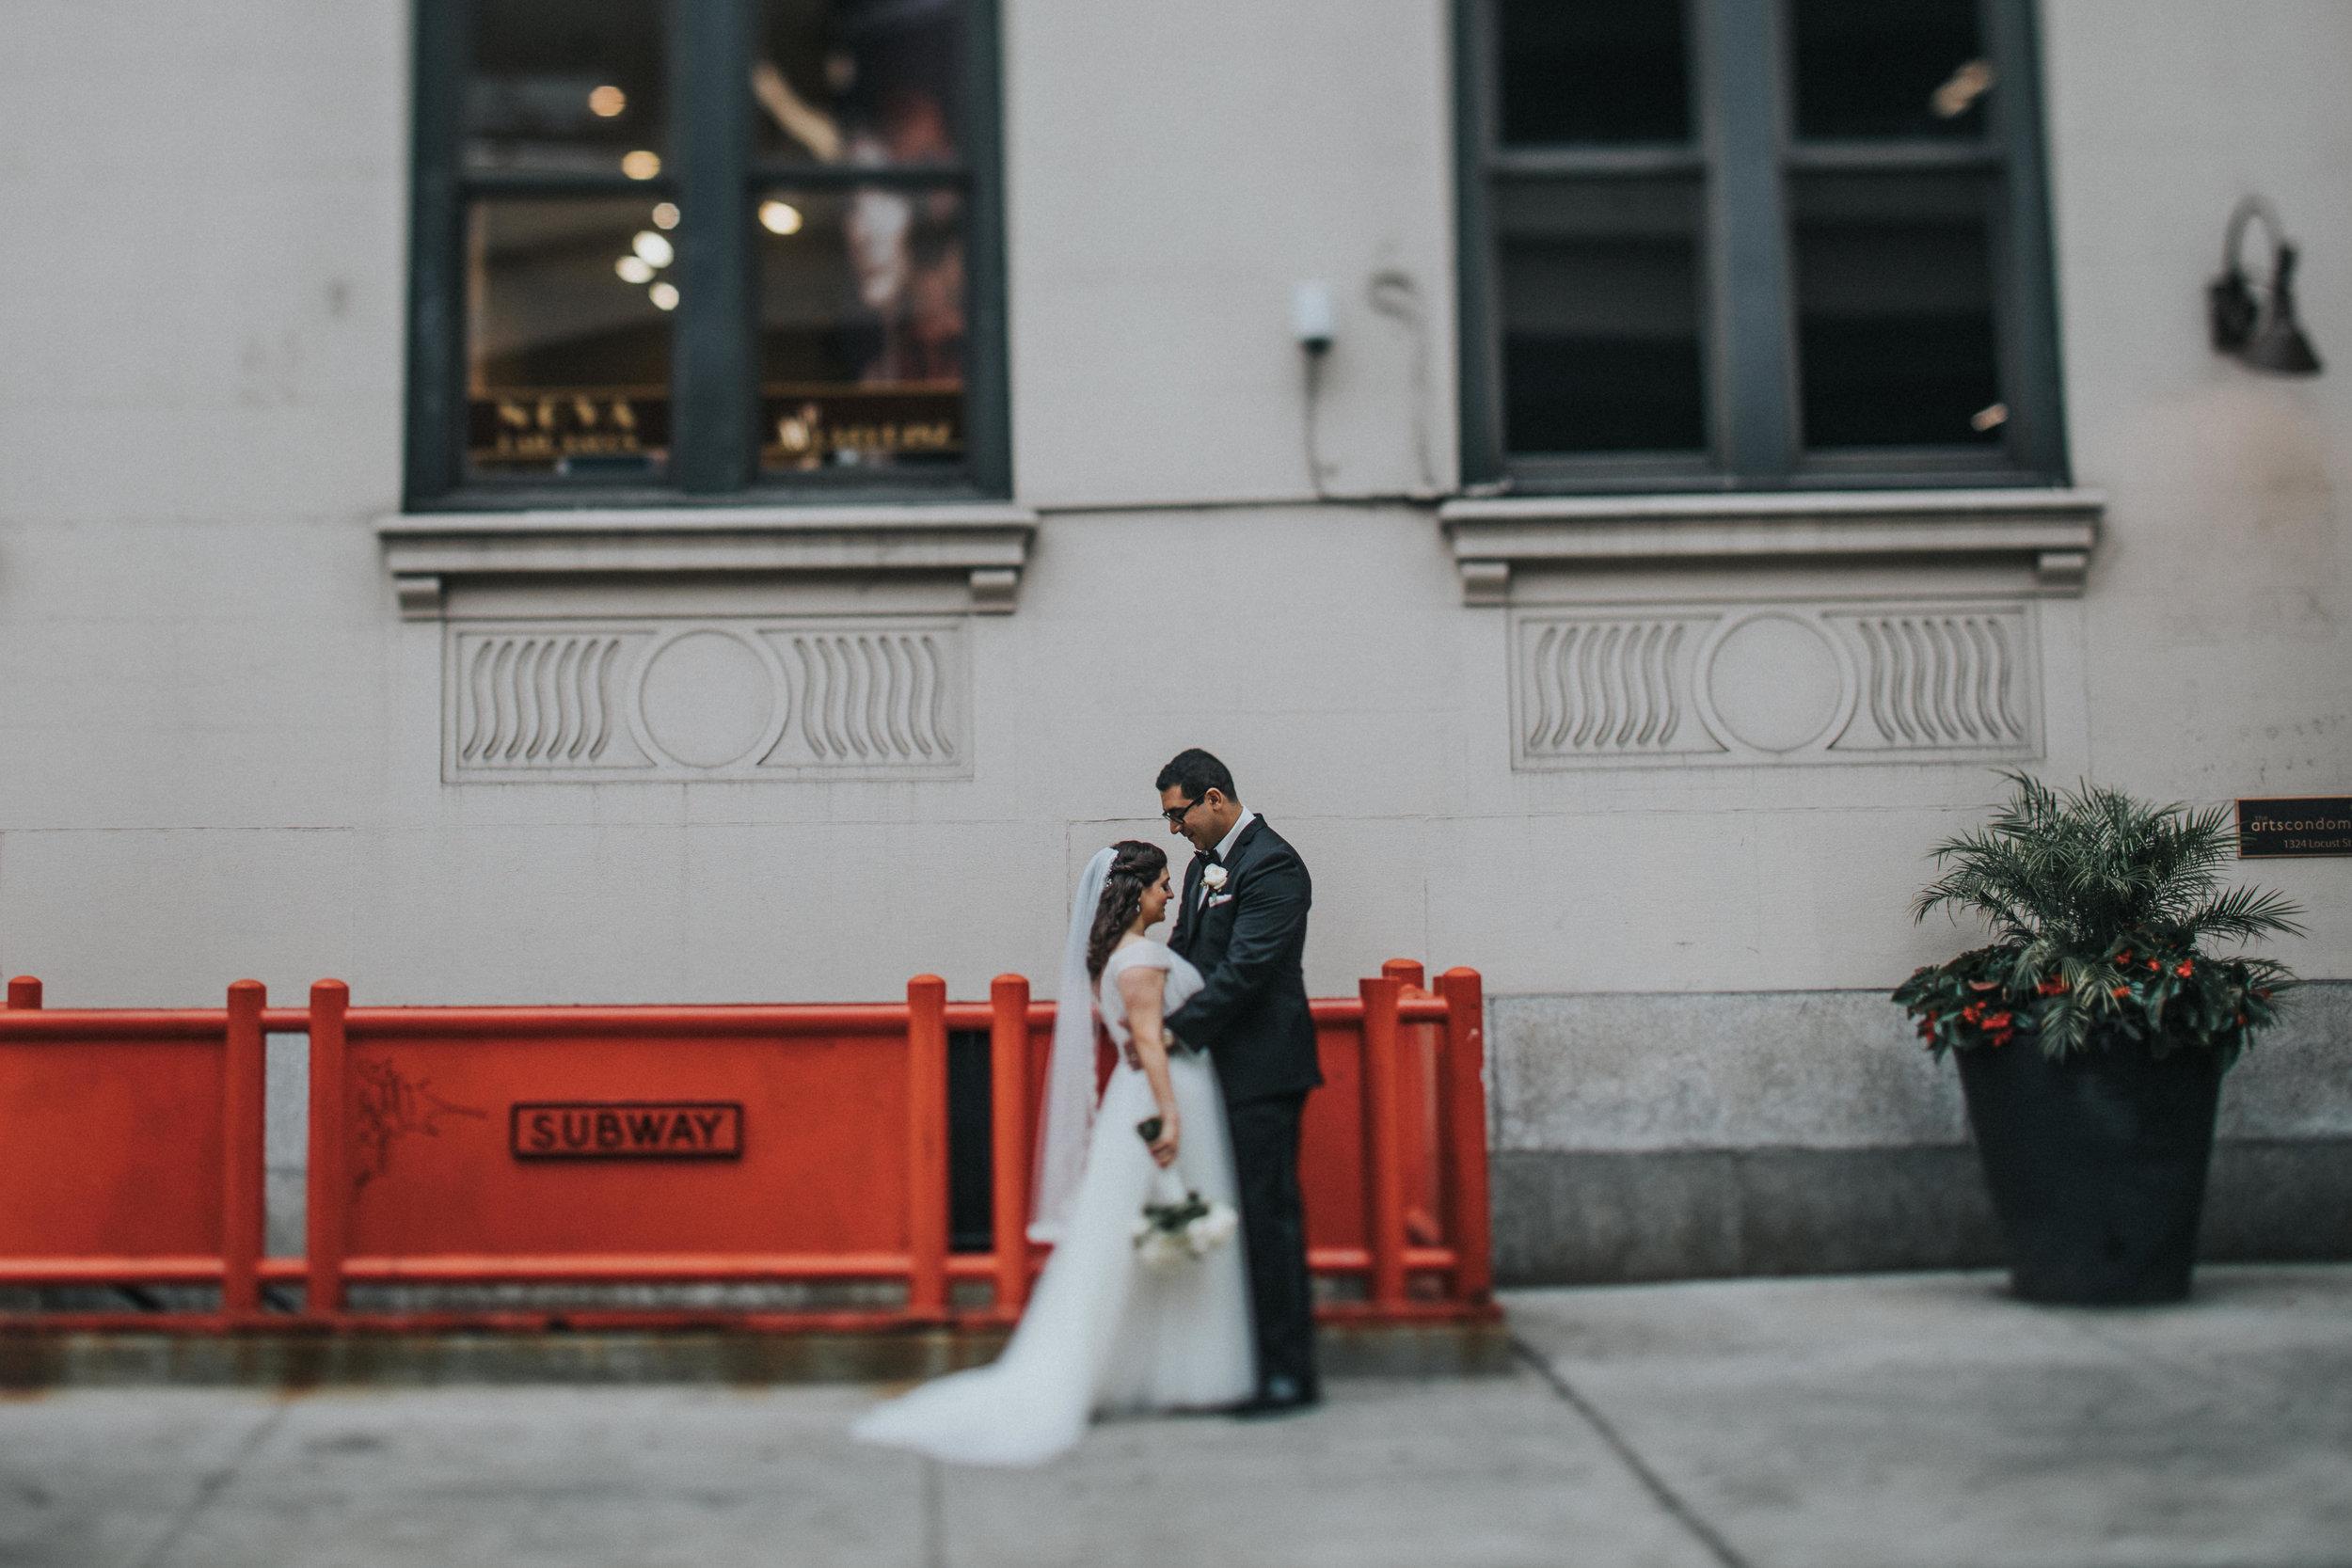 JennaLynnPhotography-NJWeddingPhotographer-Philadelphia-Wedding-ArtsBallroom-BridalParty-84.jpg